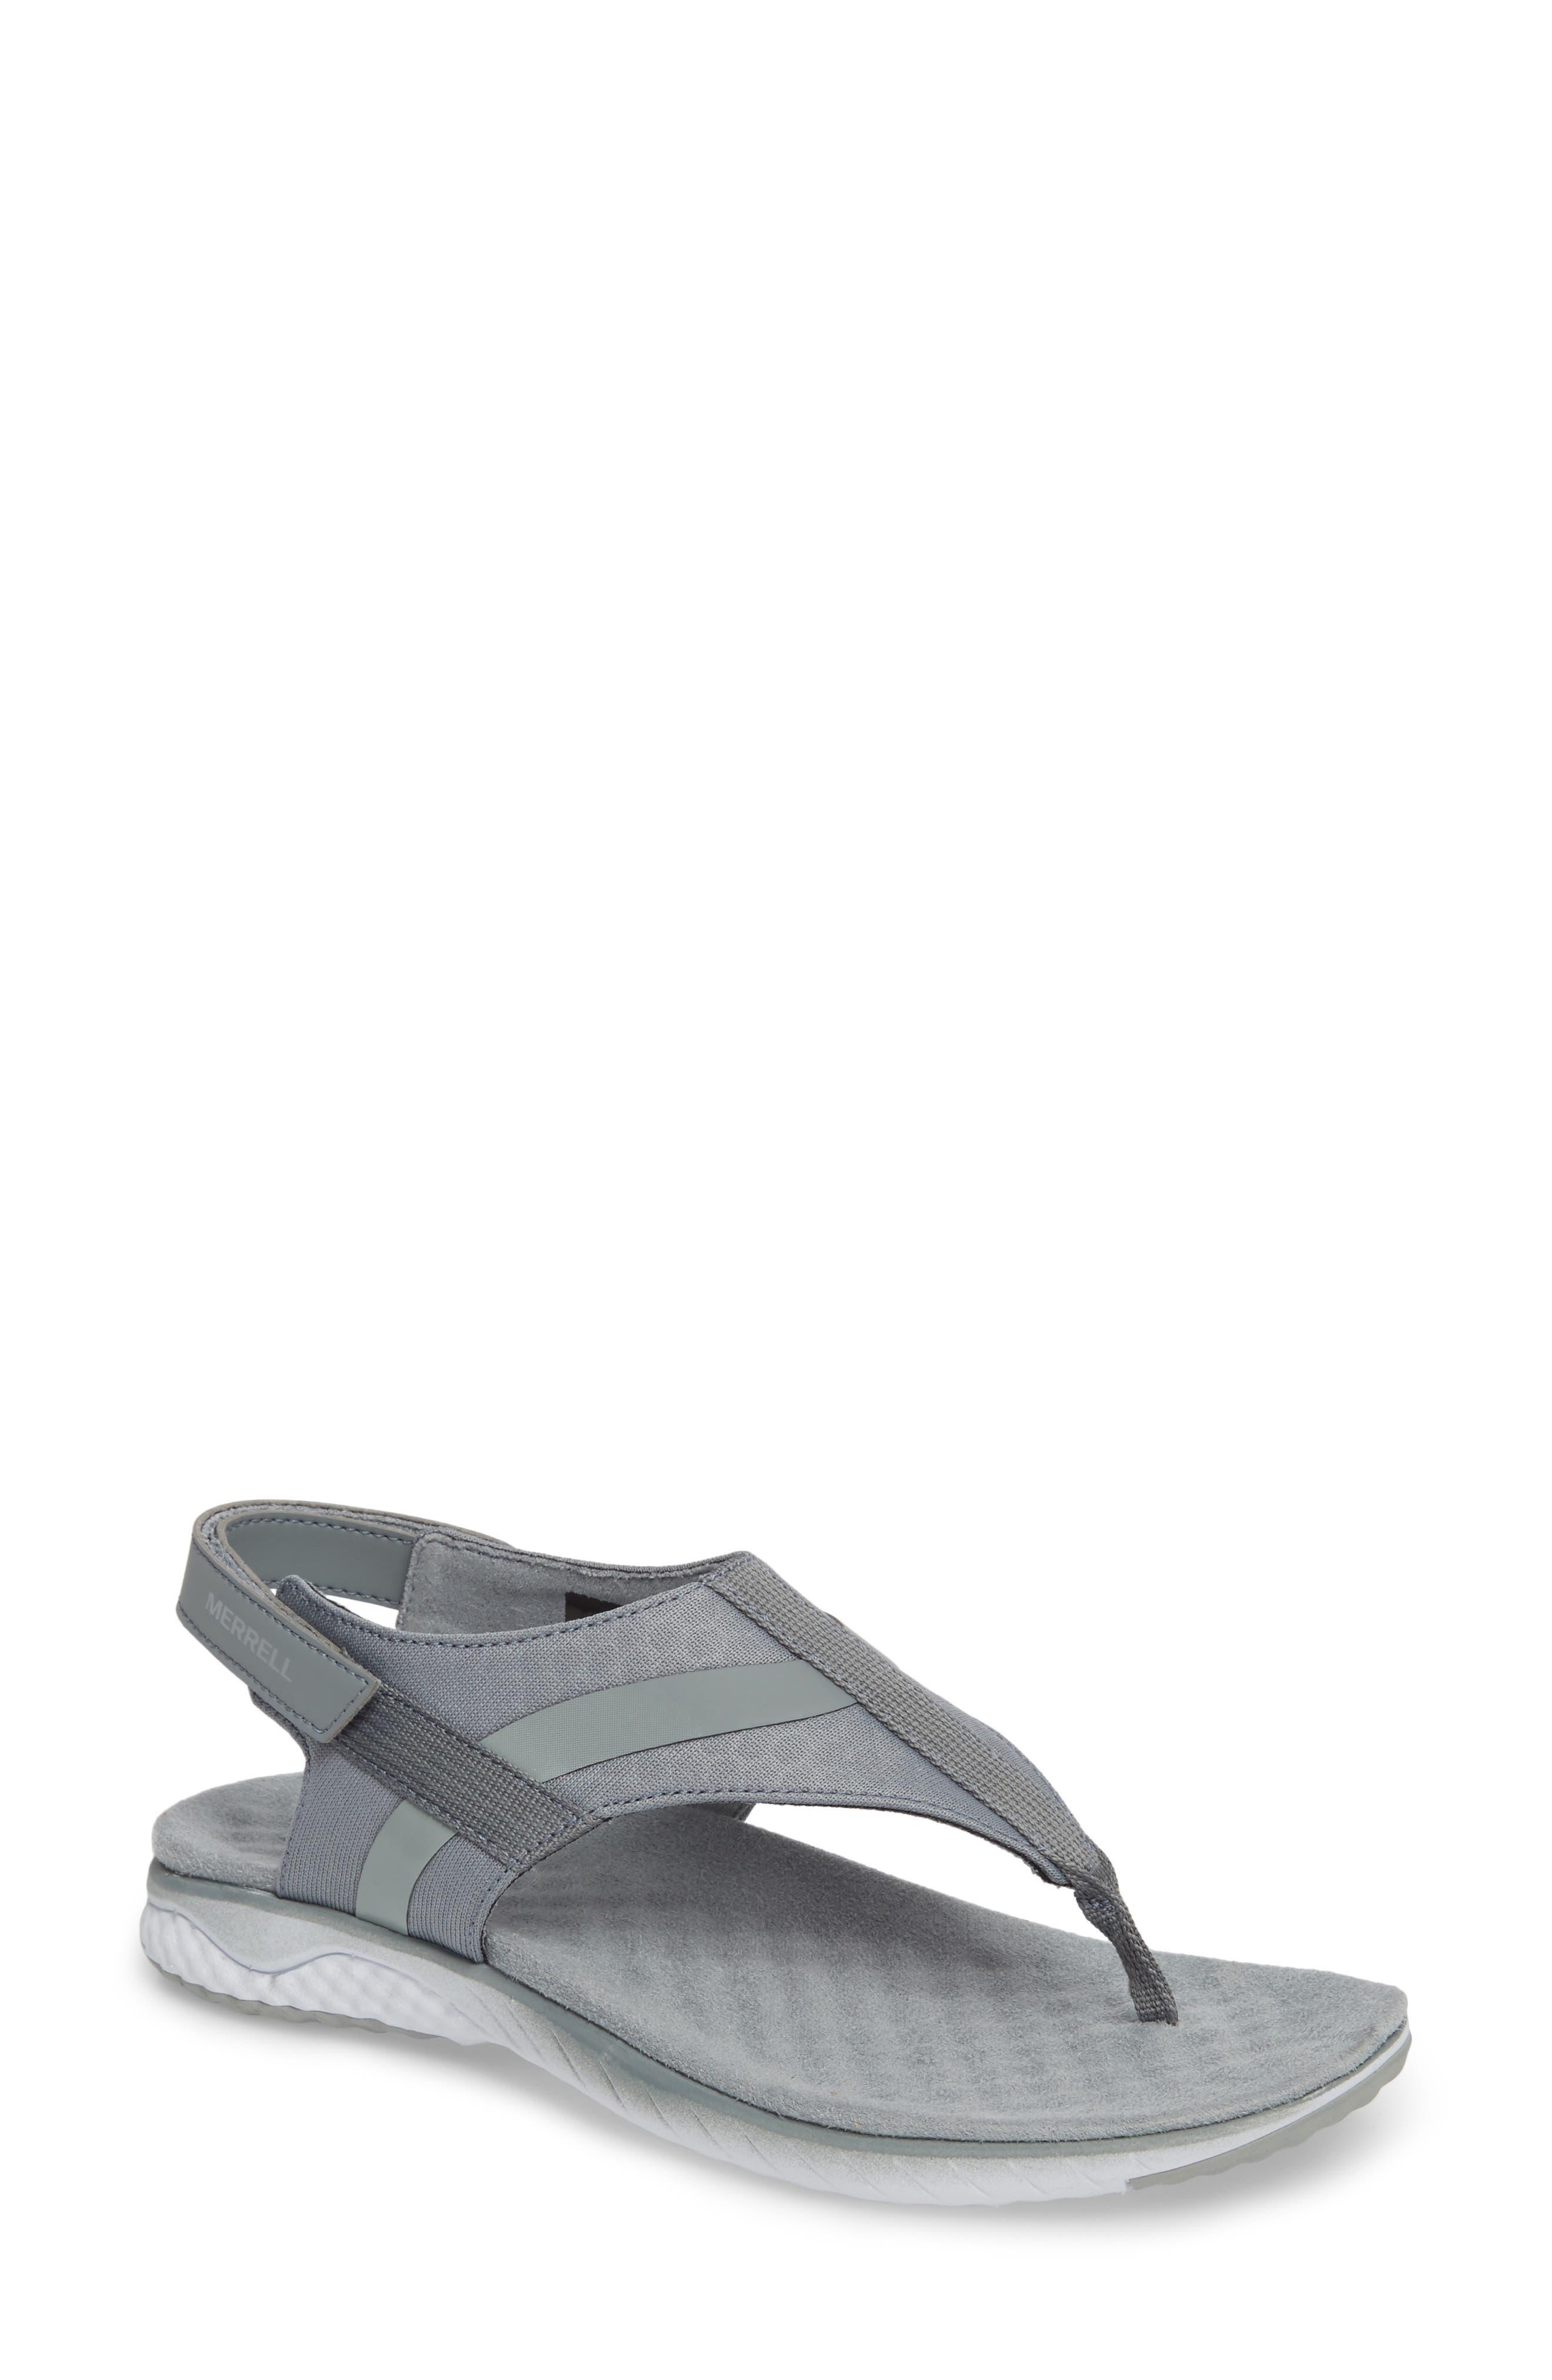 Merrell 1SIX8 Linna Slide Air Cushion+ Sandal (Women)